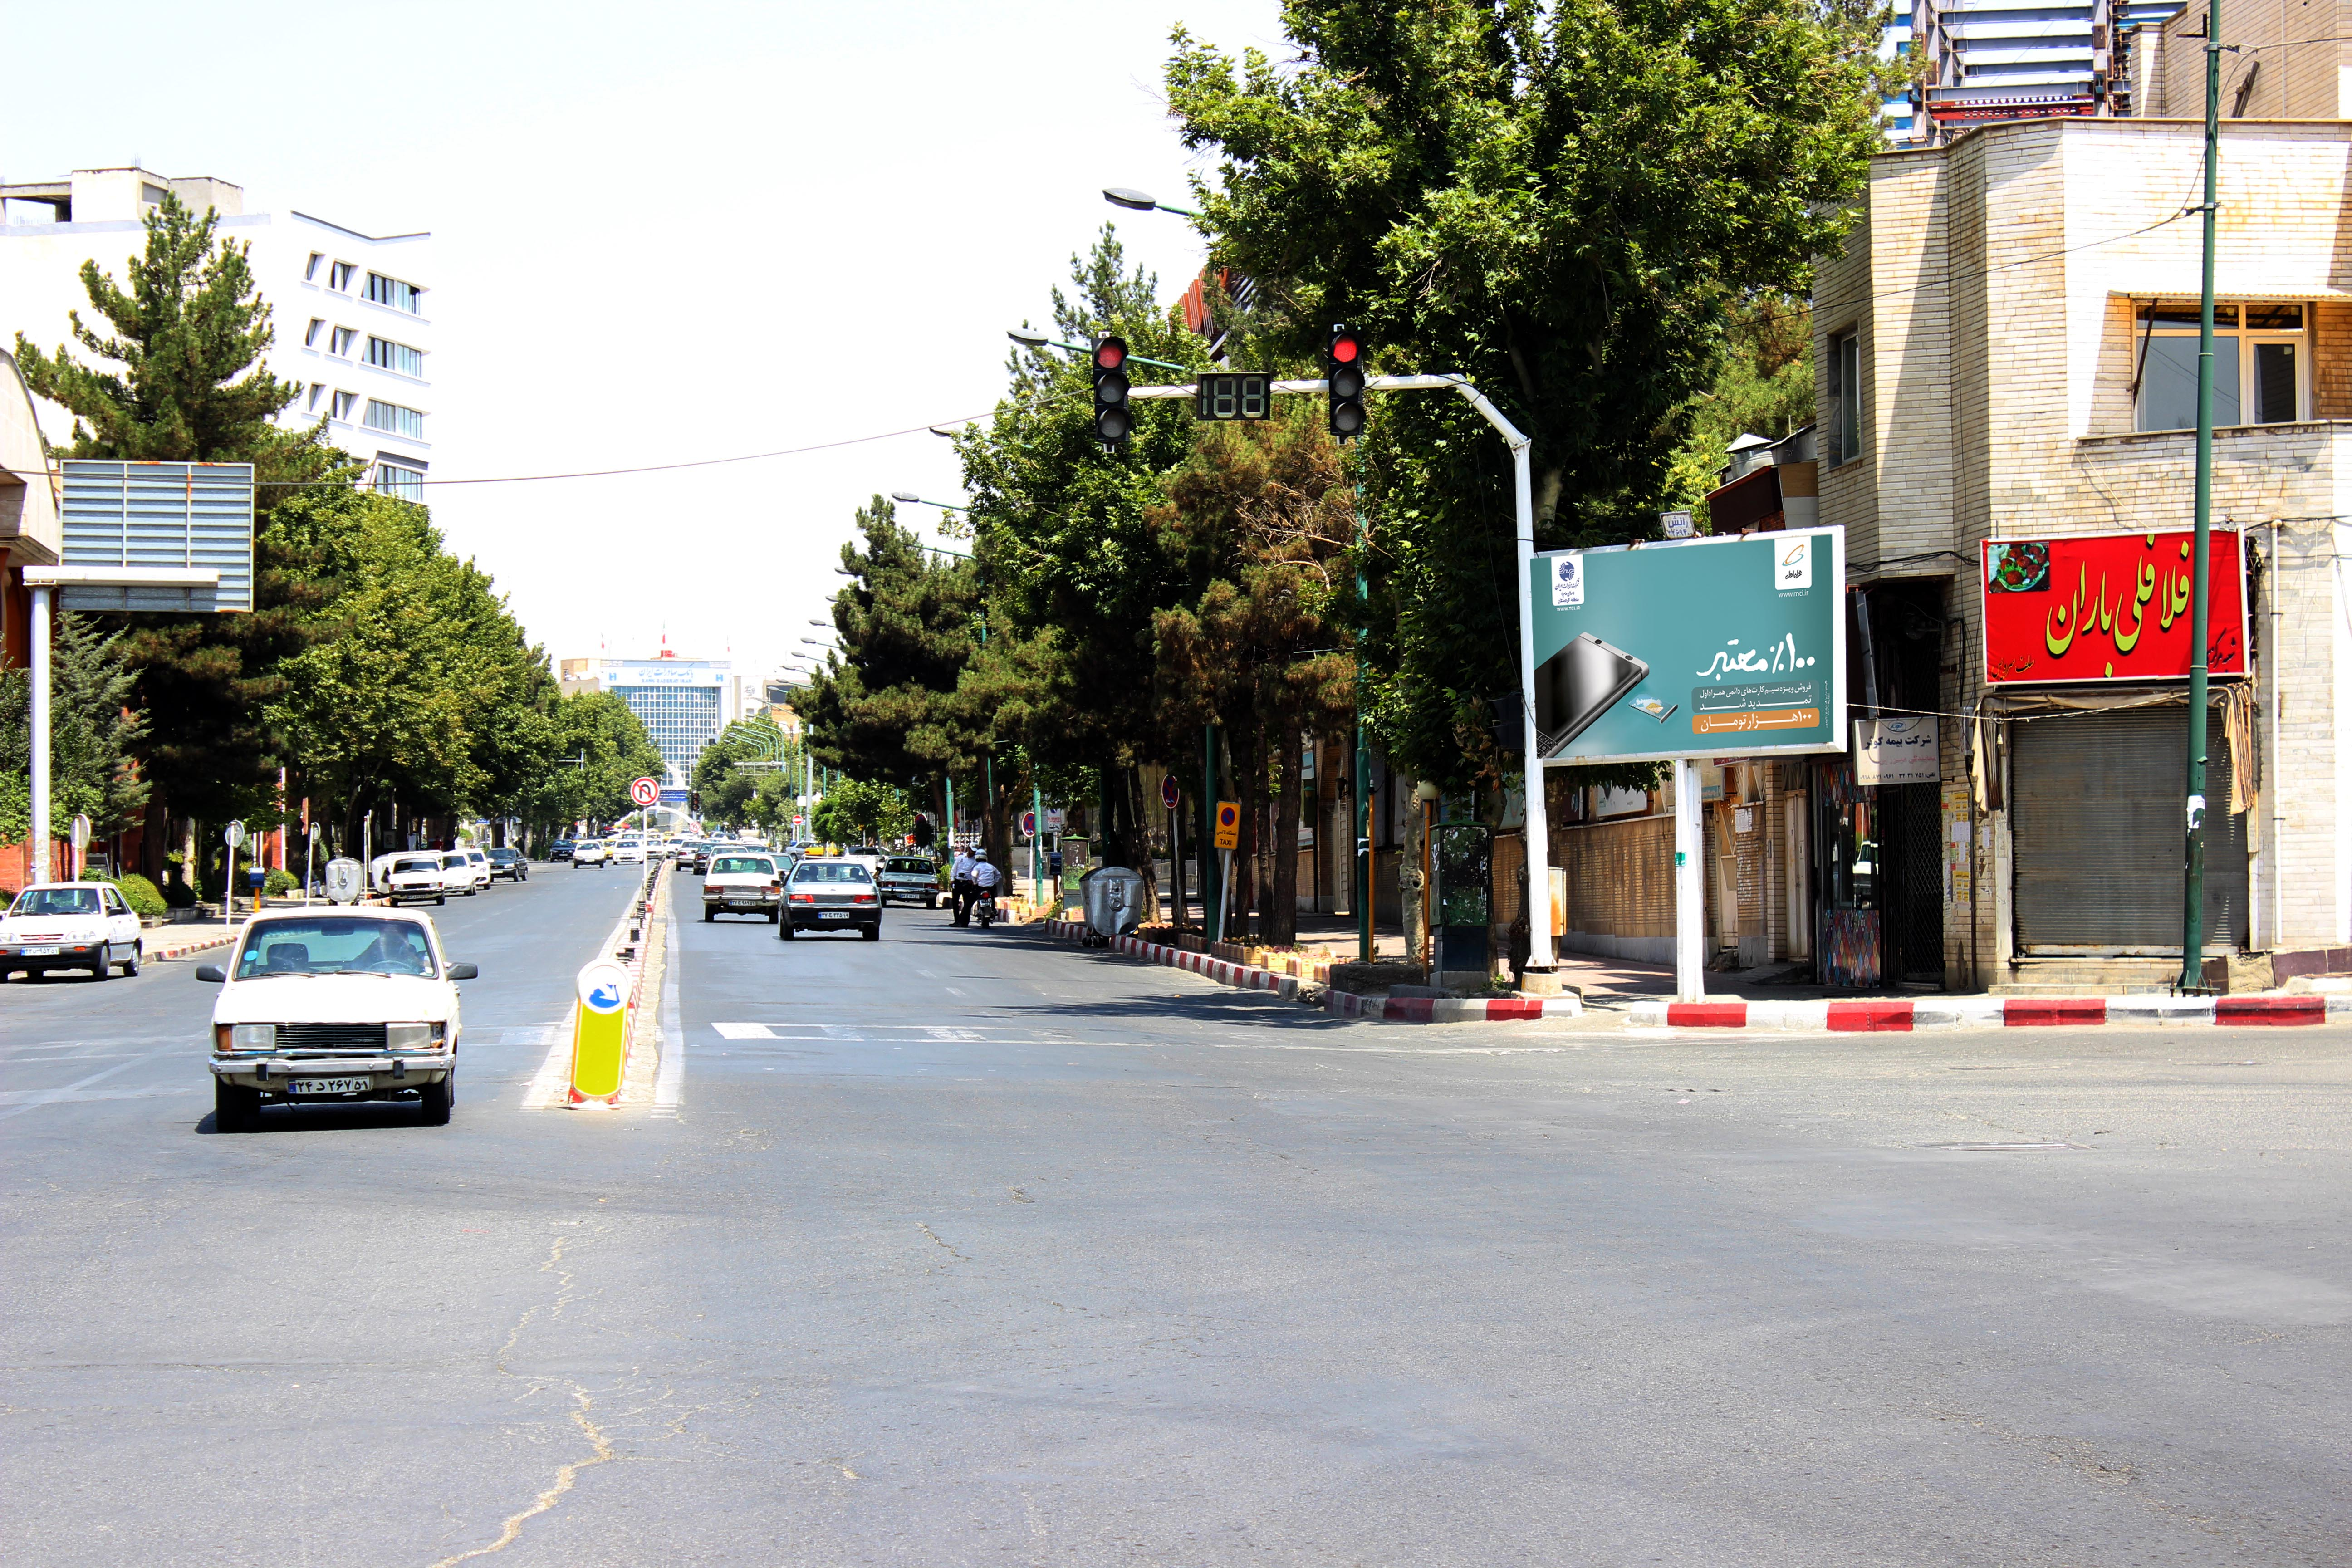 بیلبورد تبلیغاتی سه راه ادب سنندج نبش اداره اوقاف